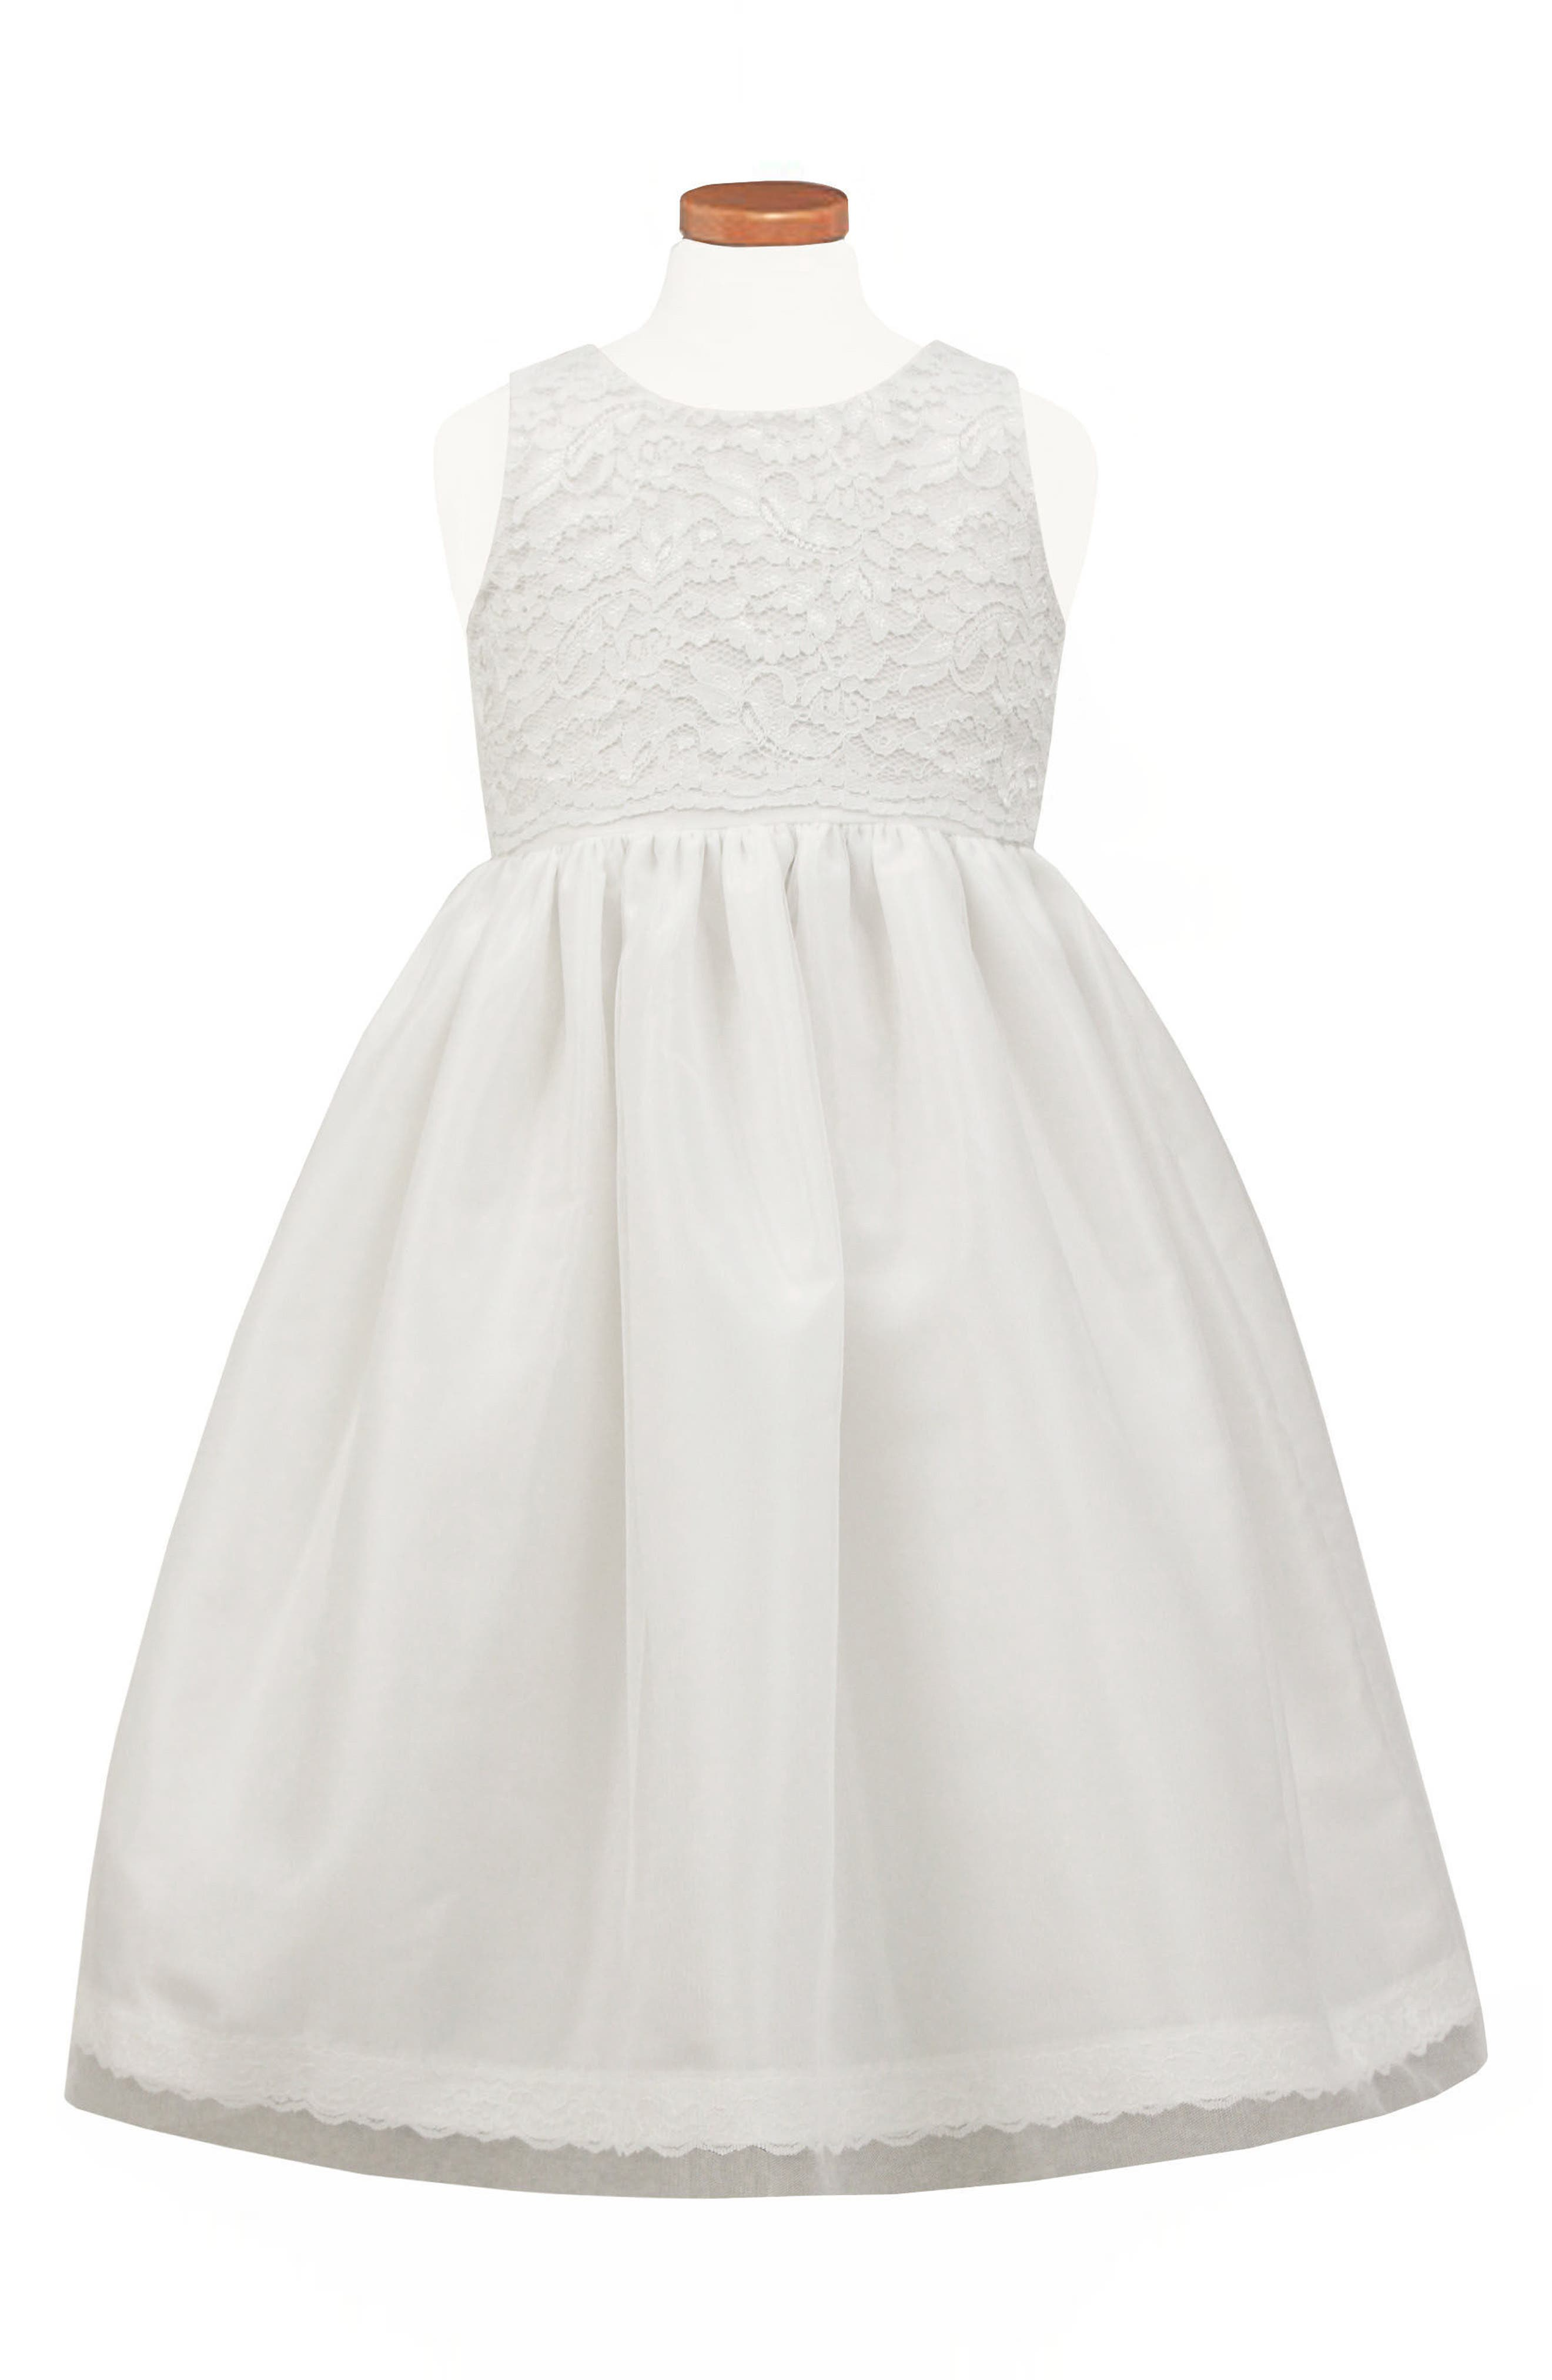 Sorbet Lace Fit & Flare Dress (Big Girls)